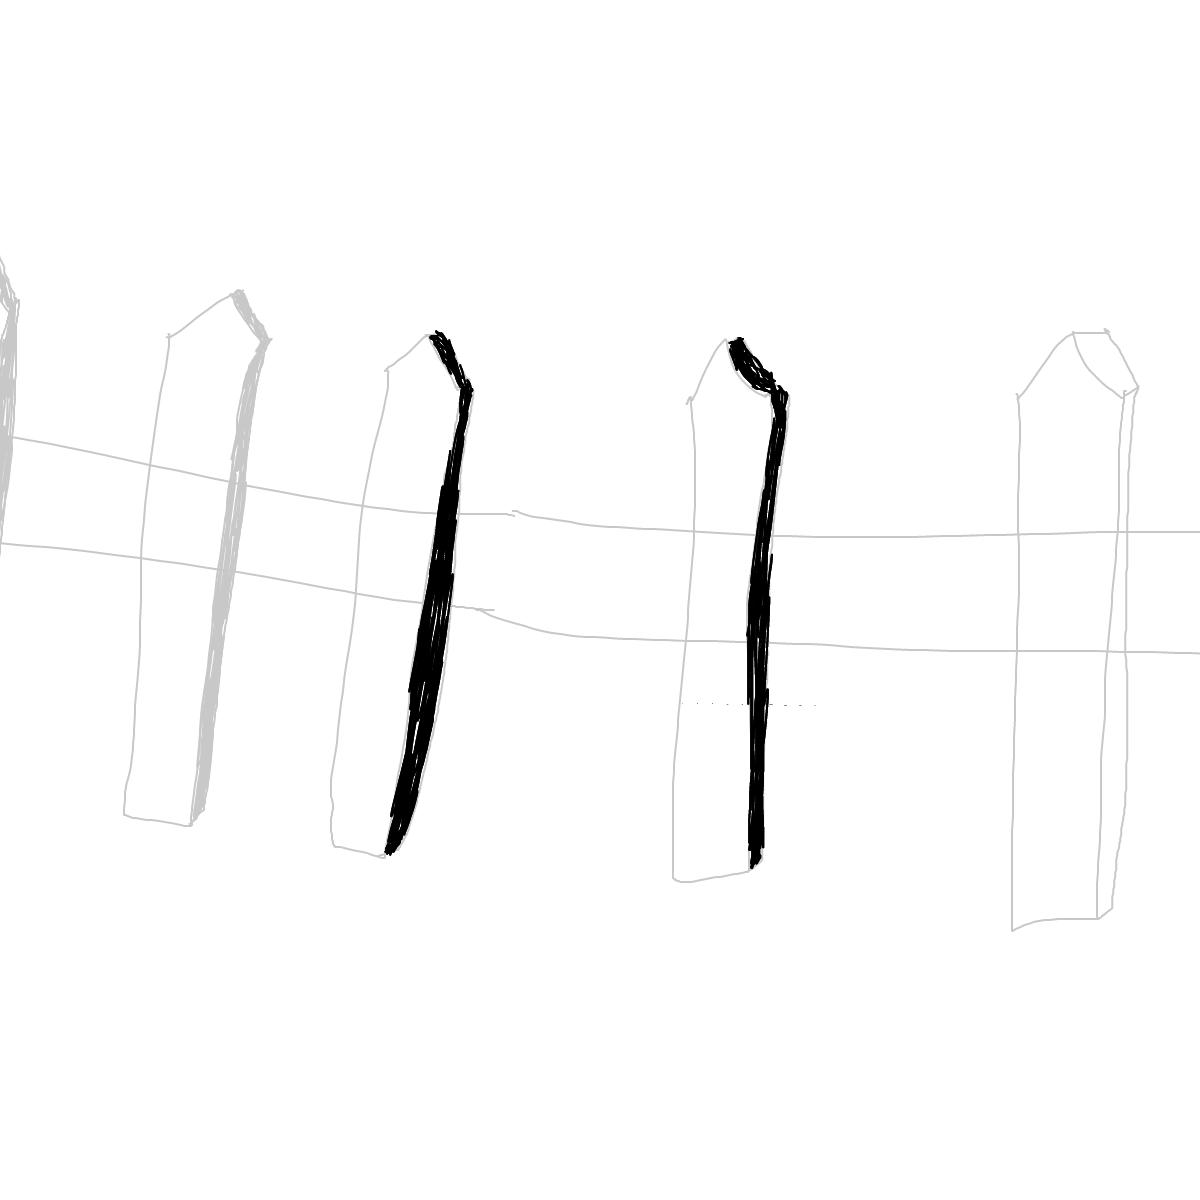 BAAAM drawing#9380 lat:52.4750518798828100lng: 13.4072132110595700